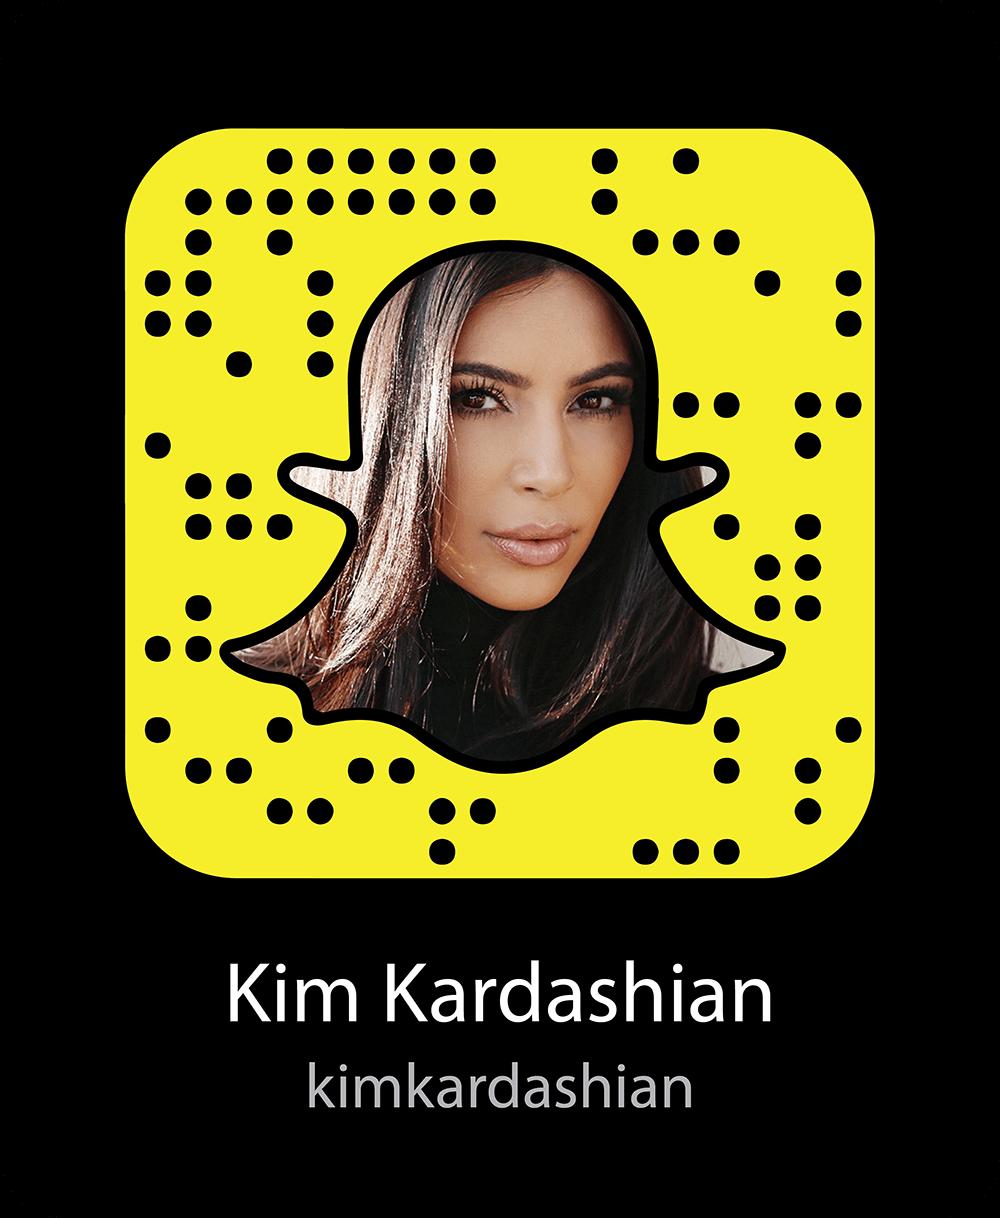 kim-kardashian-celebrity-snapchat-snapcode